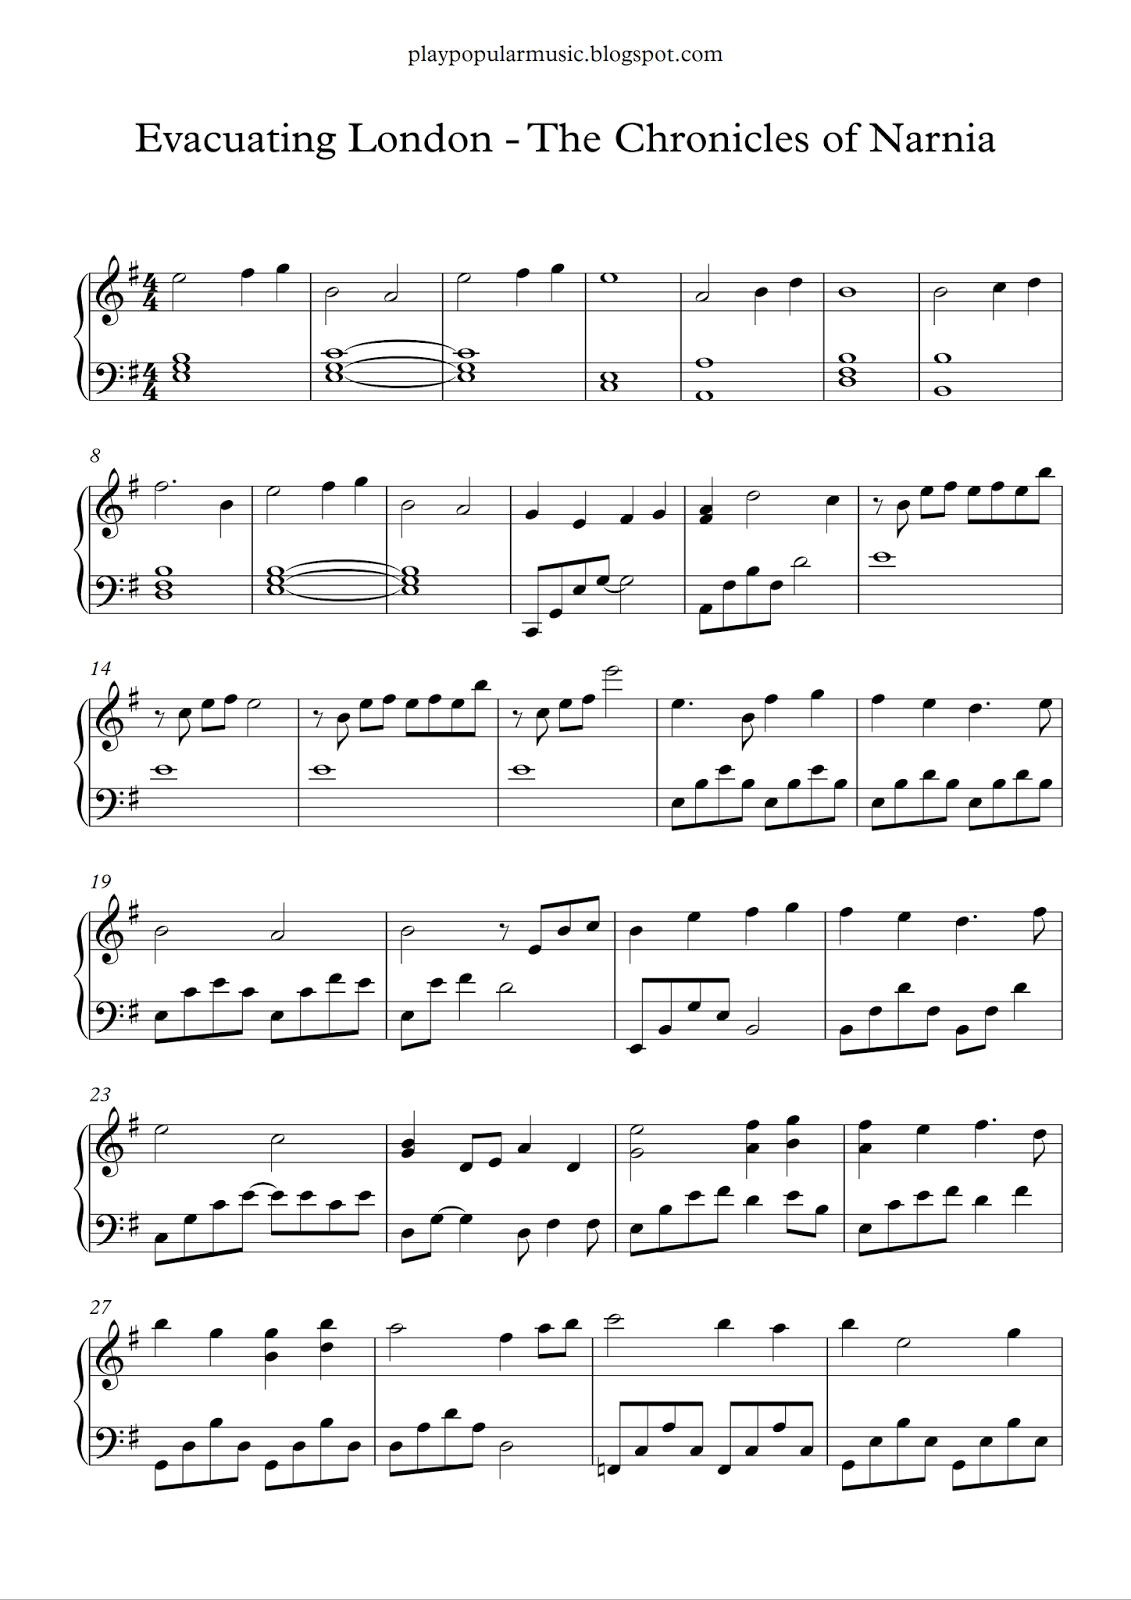 Free Piano Sheet Music: Evacuating London - The Chronicles Of Narnia - Free Printable Music Sheets Pdf